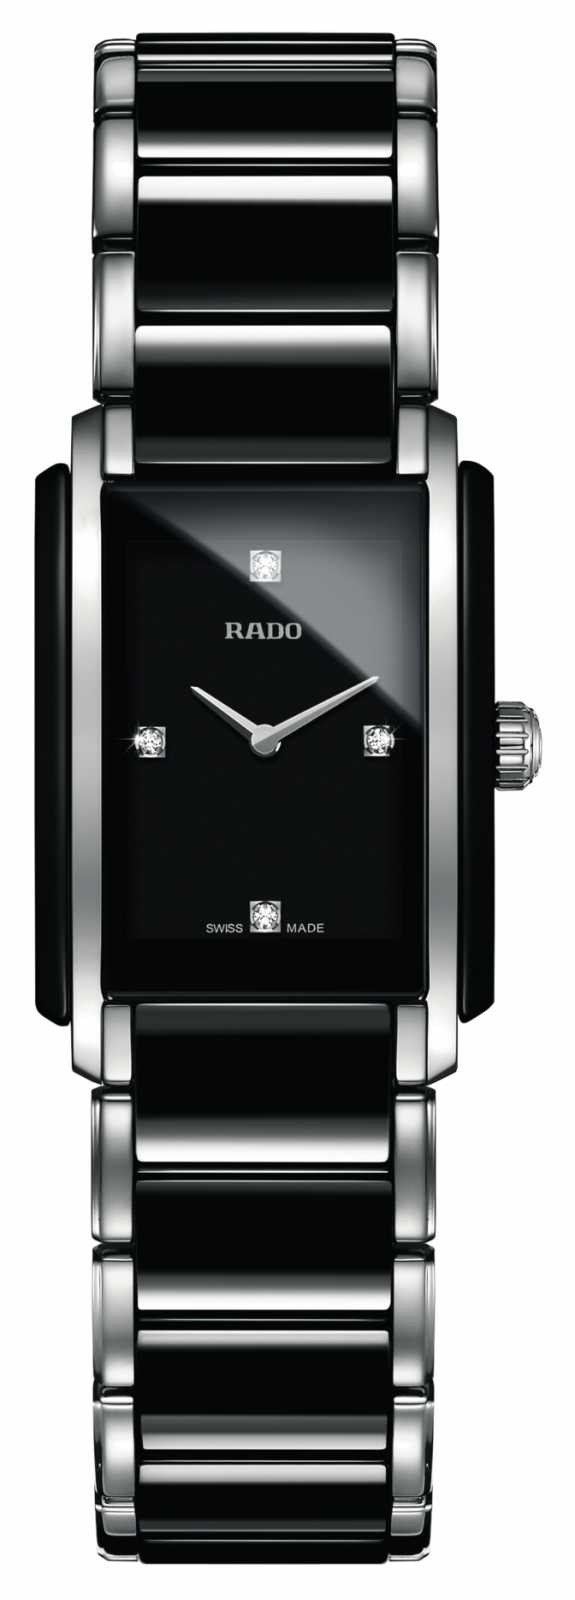 RADO Integral Diamonds High-Tech Ceramic Square Dial Watch R20613712